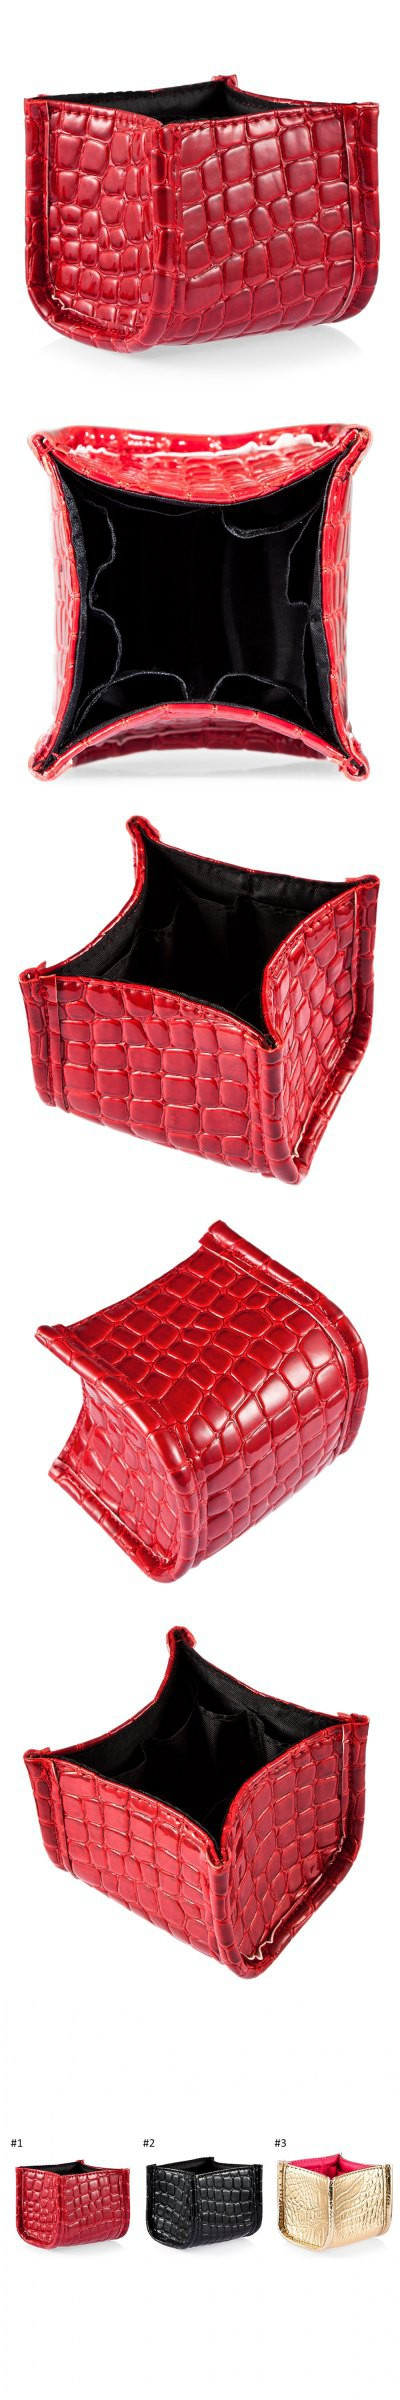 Fashion High-capacity Cosmetic Brush Storage Box